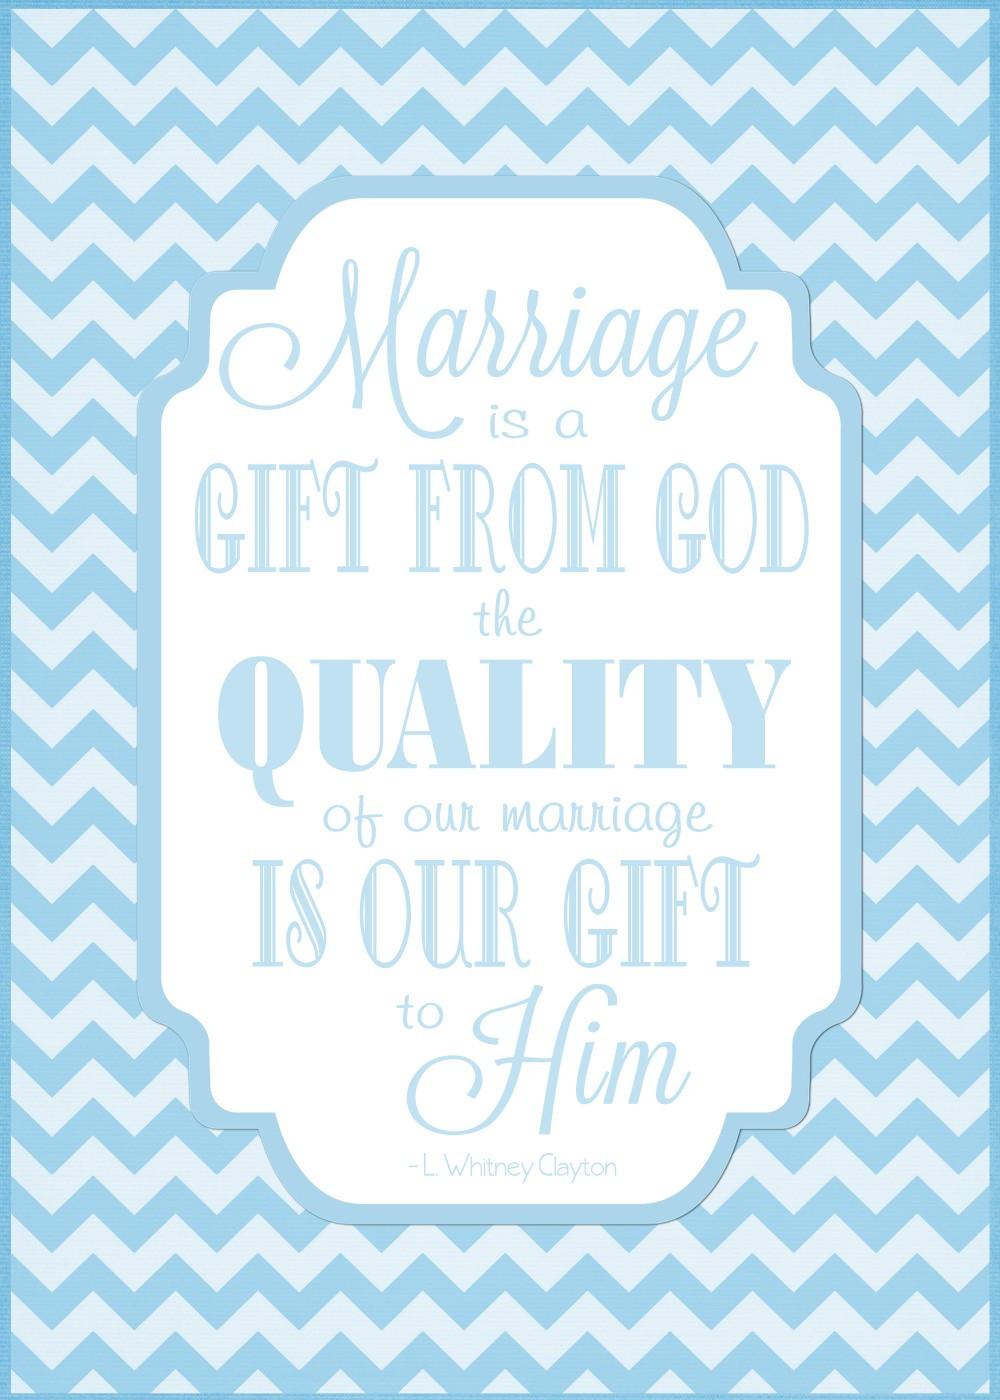 Lds Marriage Quotes  Lds Wedding Quotes QuotesGram